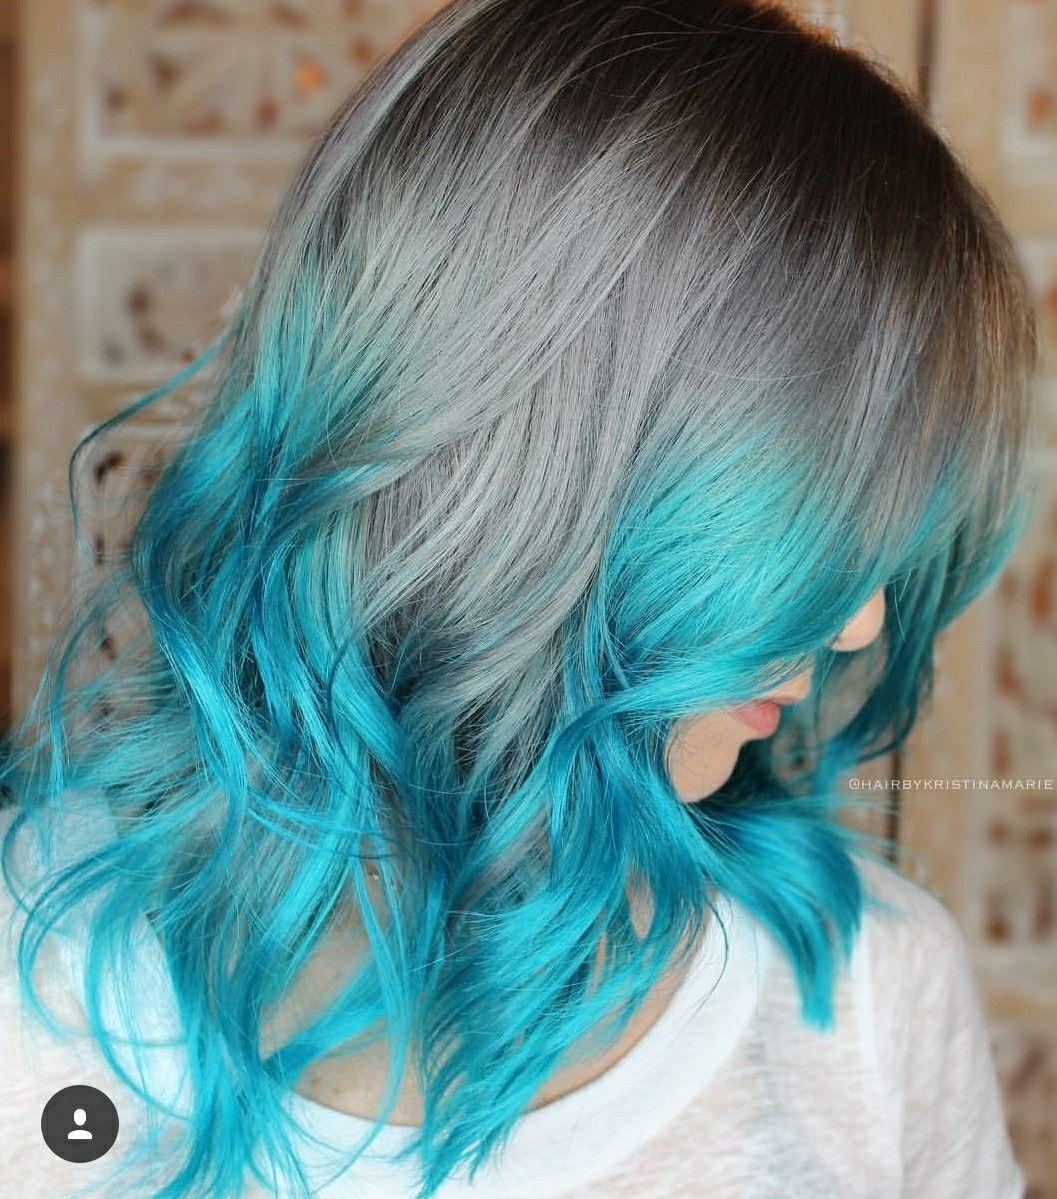 Grey and blue hair colors in pinterest hair hair styles